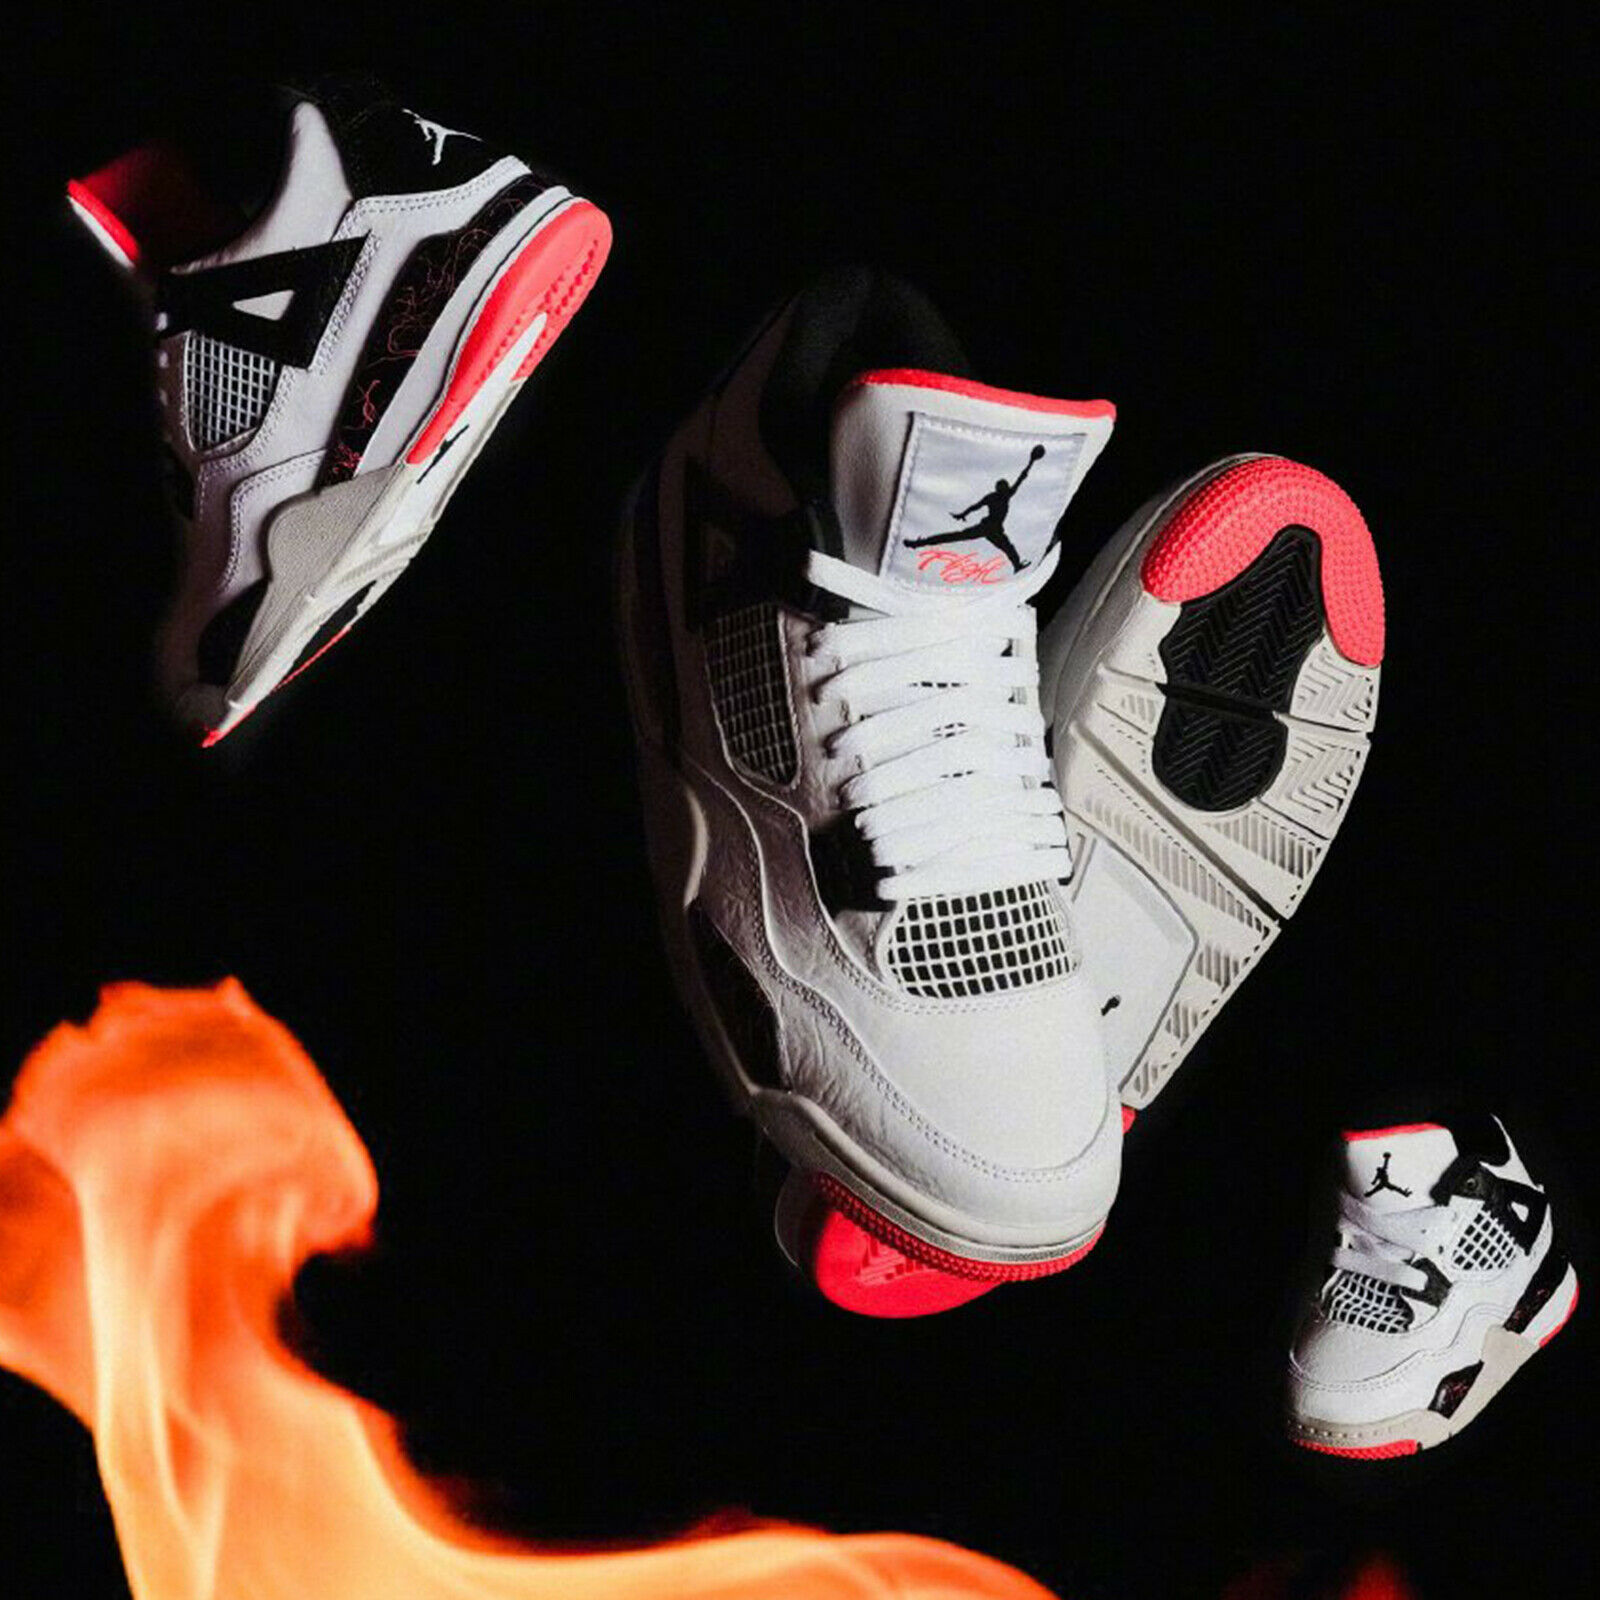 Nike Air Jordan 4 Retro Bright Crimson Pale Citron Hot Lava Men Women Kid Pick 1